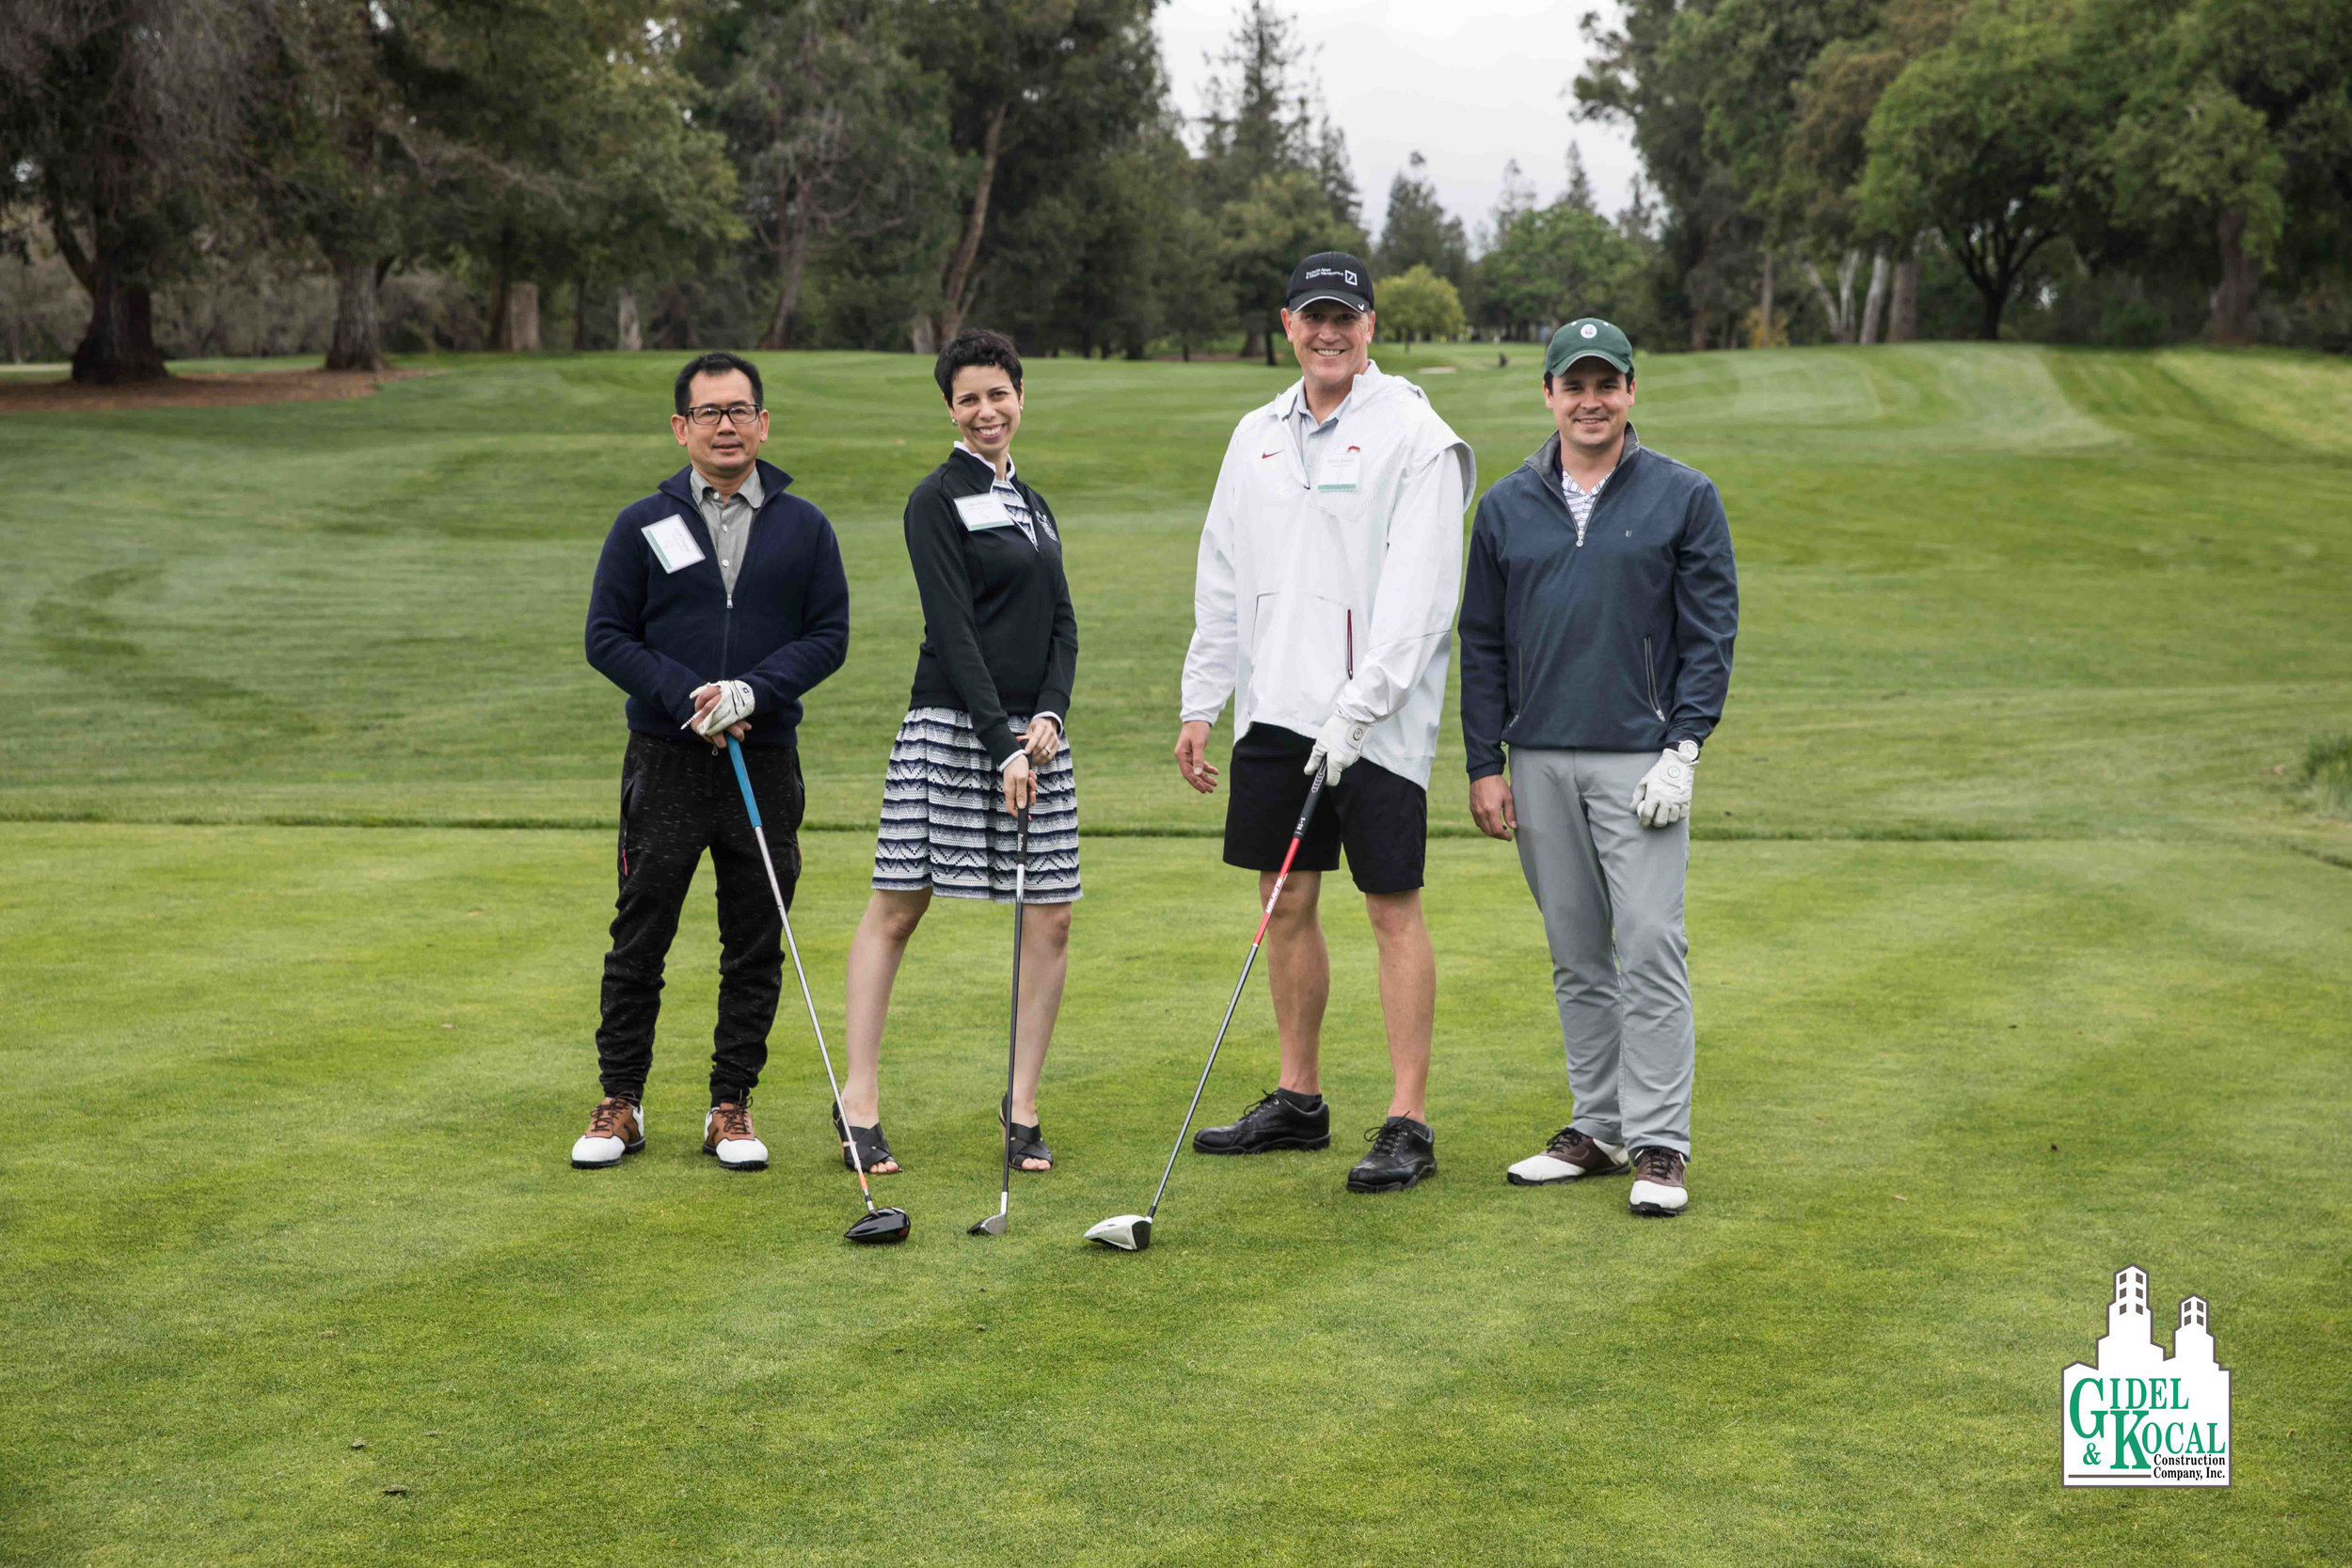 2017-04-17_GK_Golf_DBAPIX-188_LORES.jpg